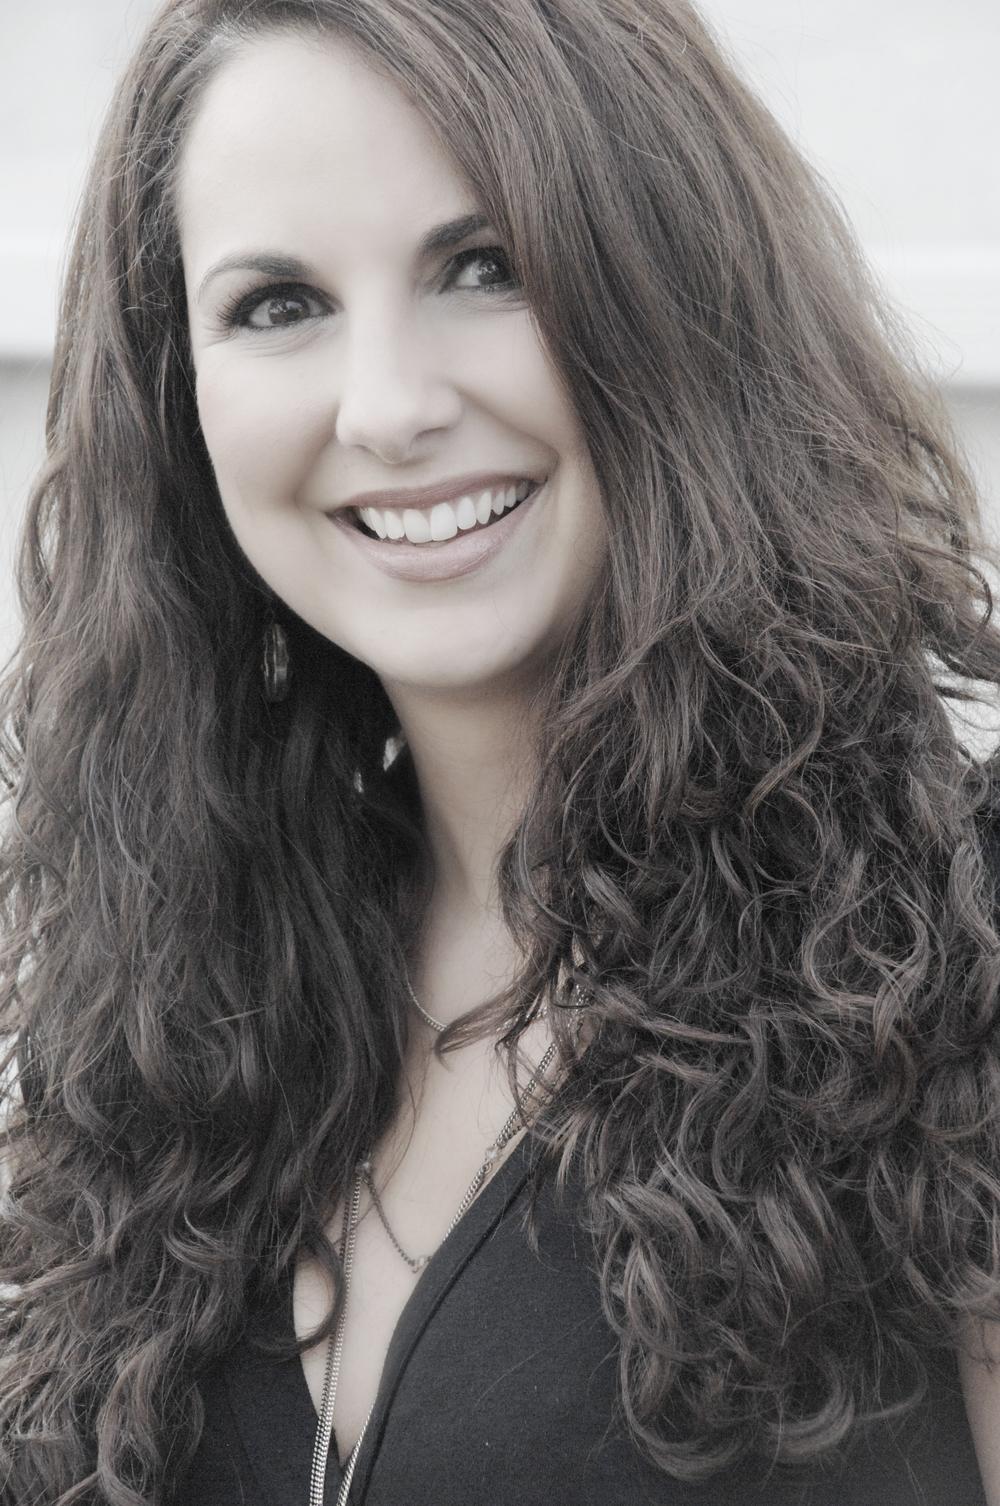 Gabrielle Troisi PA-C Aesthetic Specialist